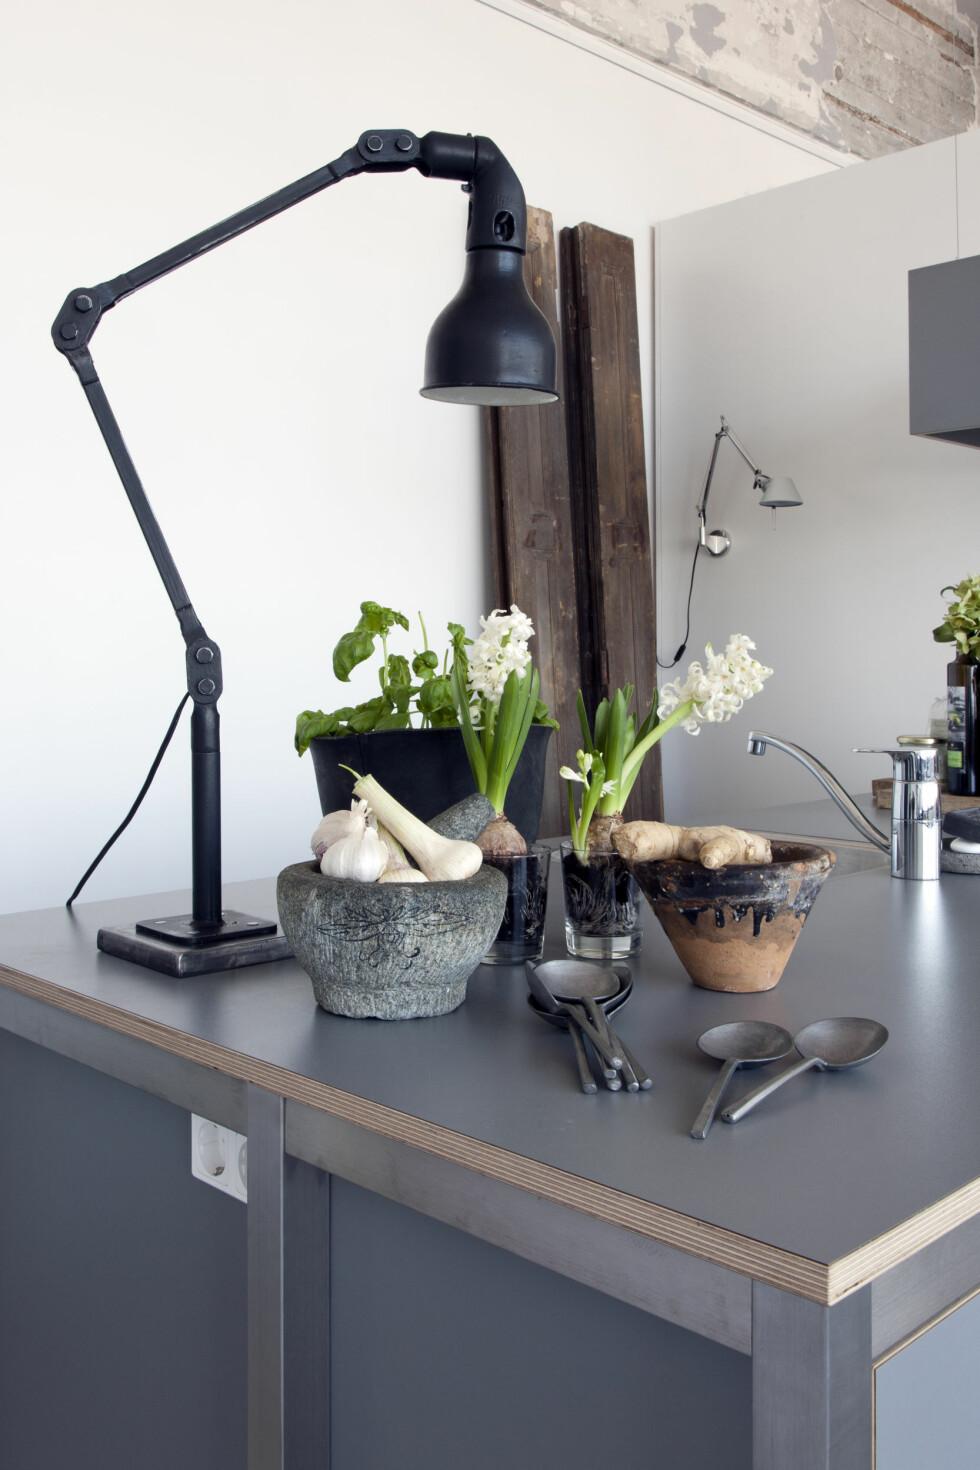 SVARTMALT: Den gamle industrilampen malte Renee svart. Det samme med terrakottapotten. Foto: Raul Candales Franch/IDECORimages.com